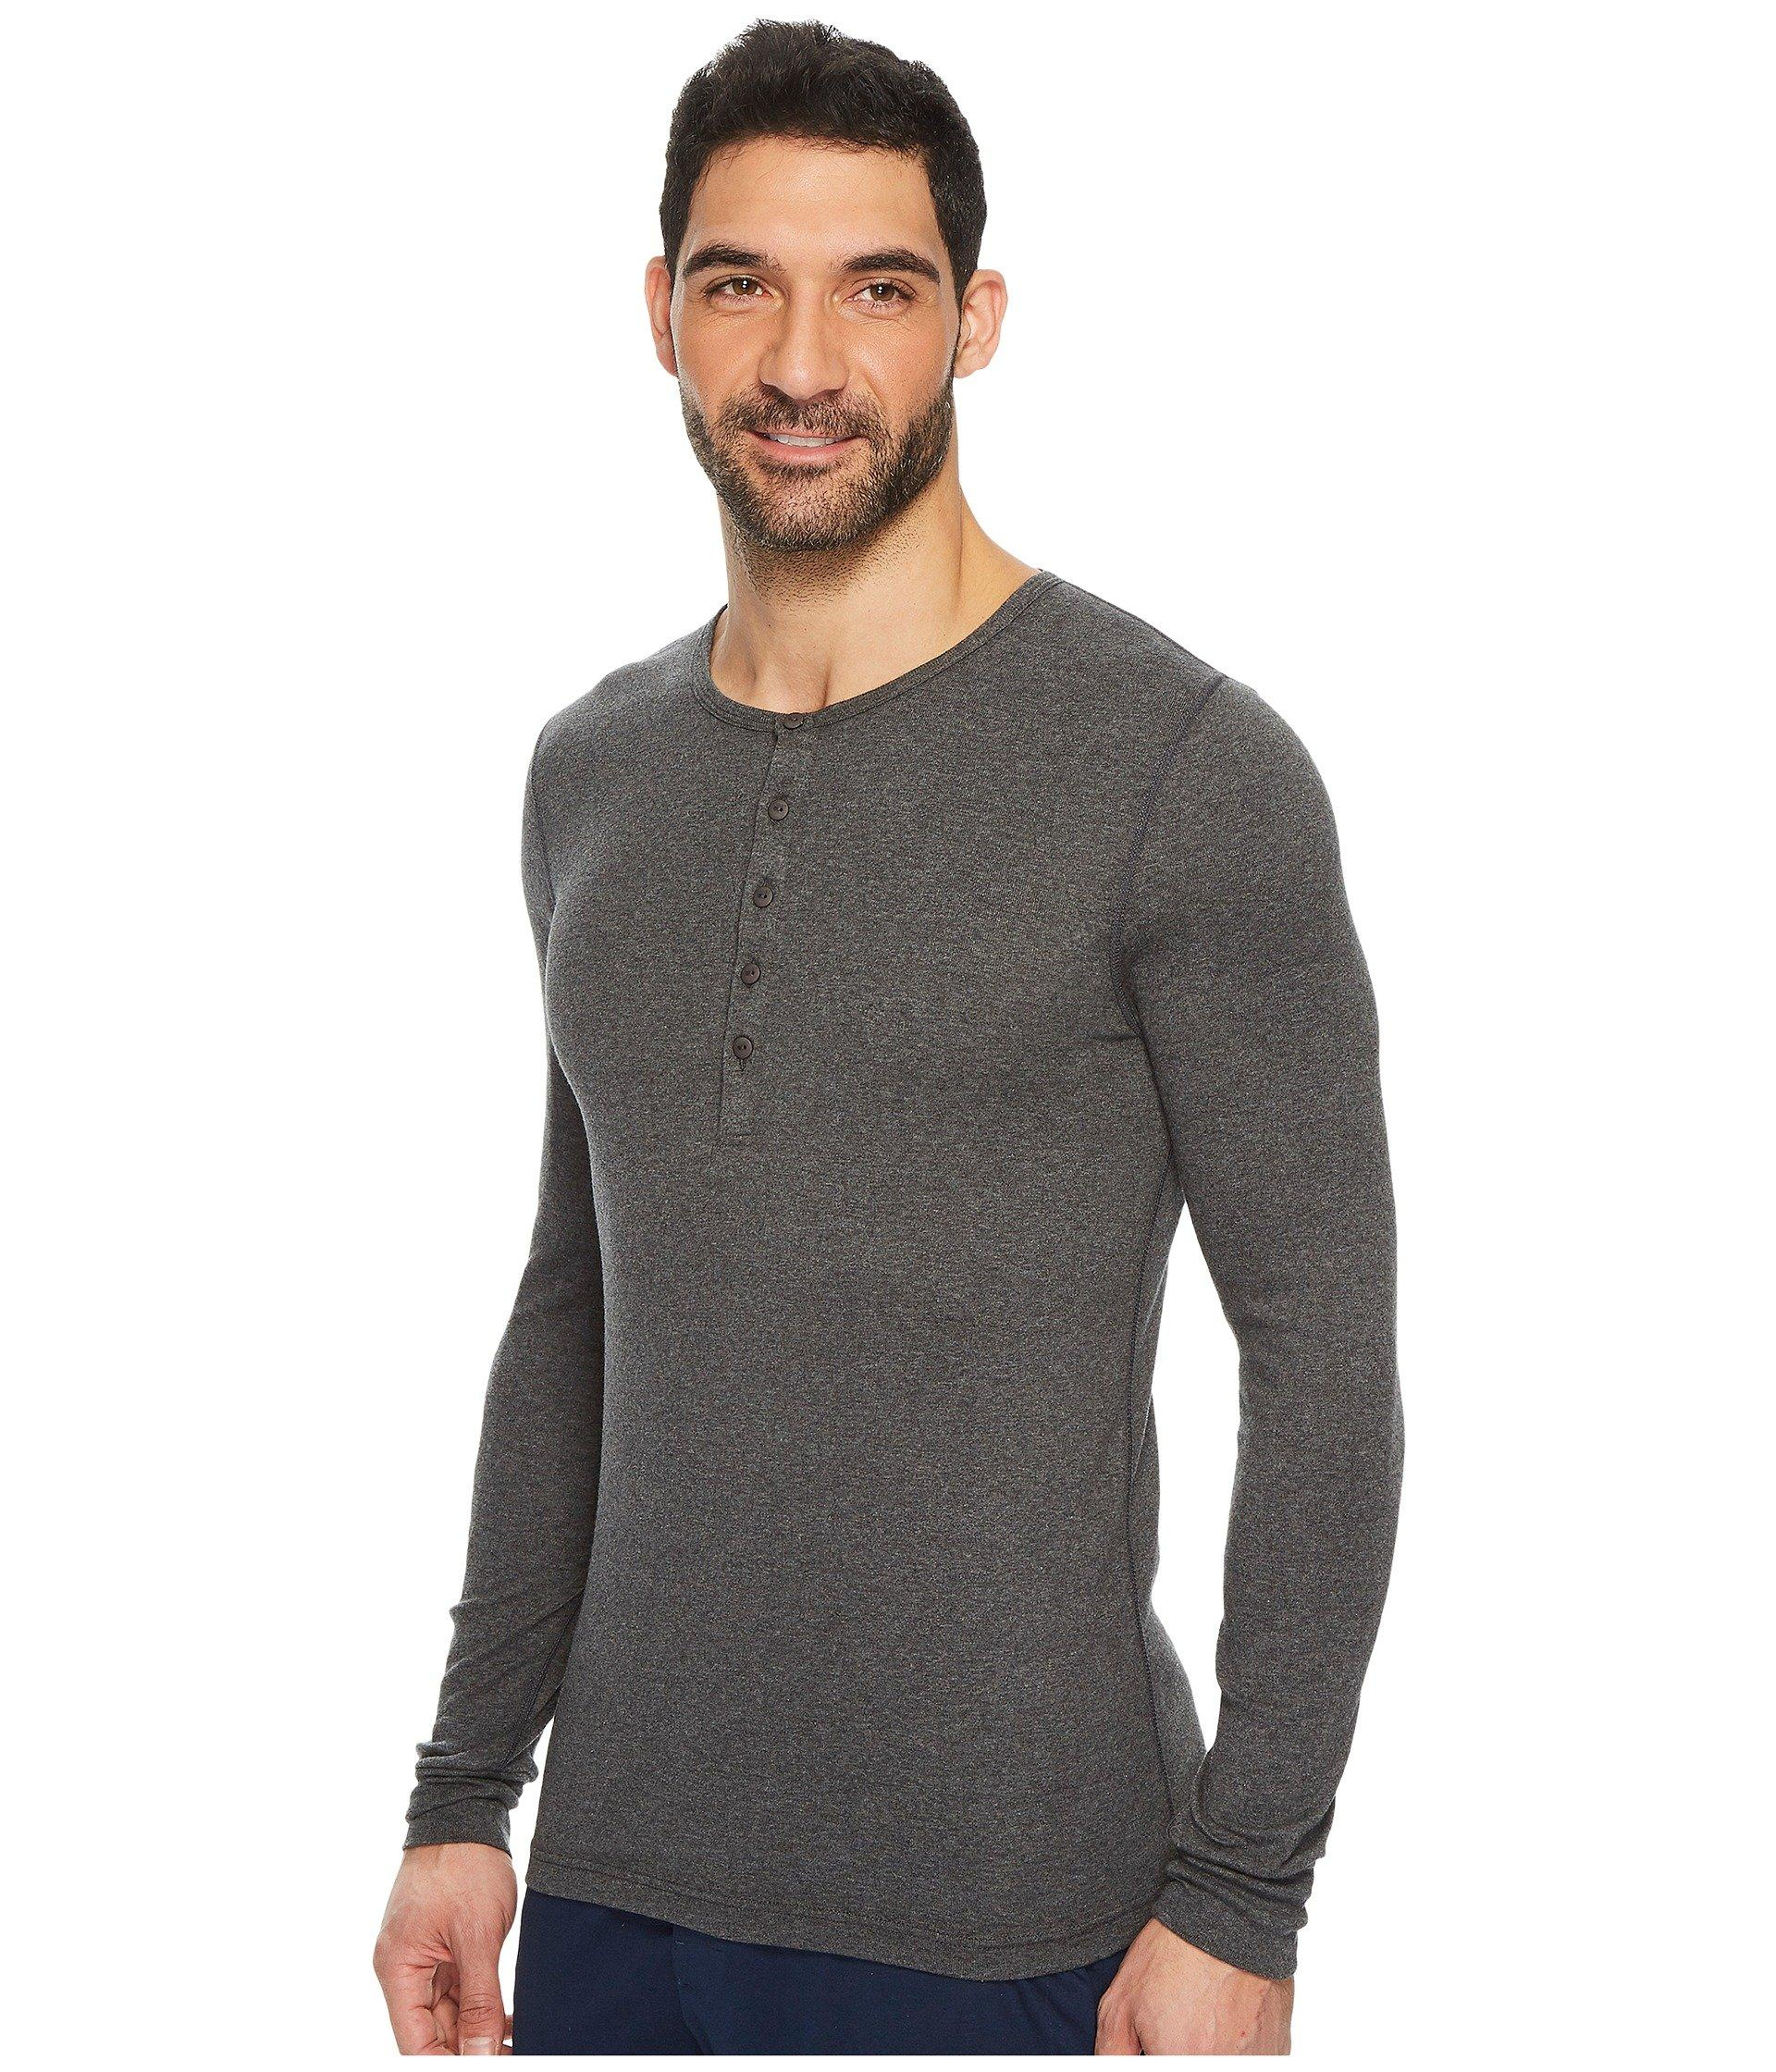 8e42ce92 Lyst - 2xist 2(x)ist Essentials L/s Henley (black) Men's T Shirt in Gray  for Men